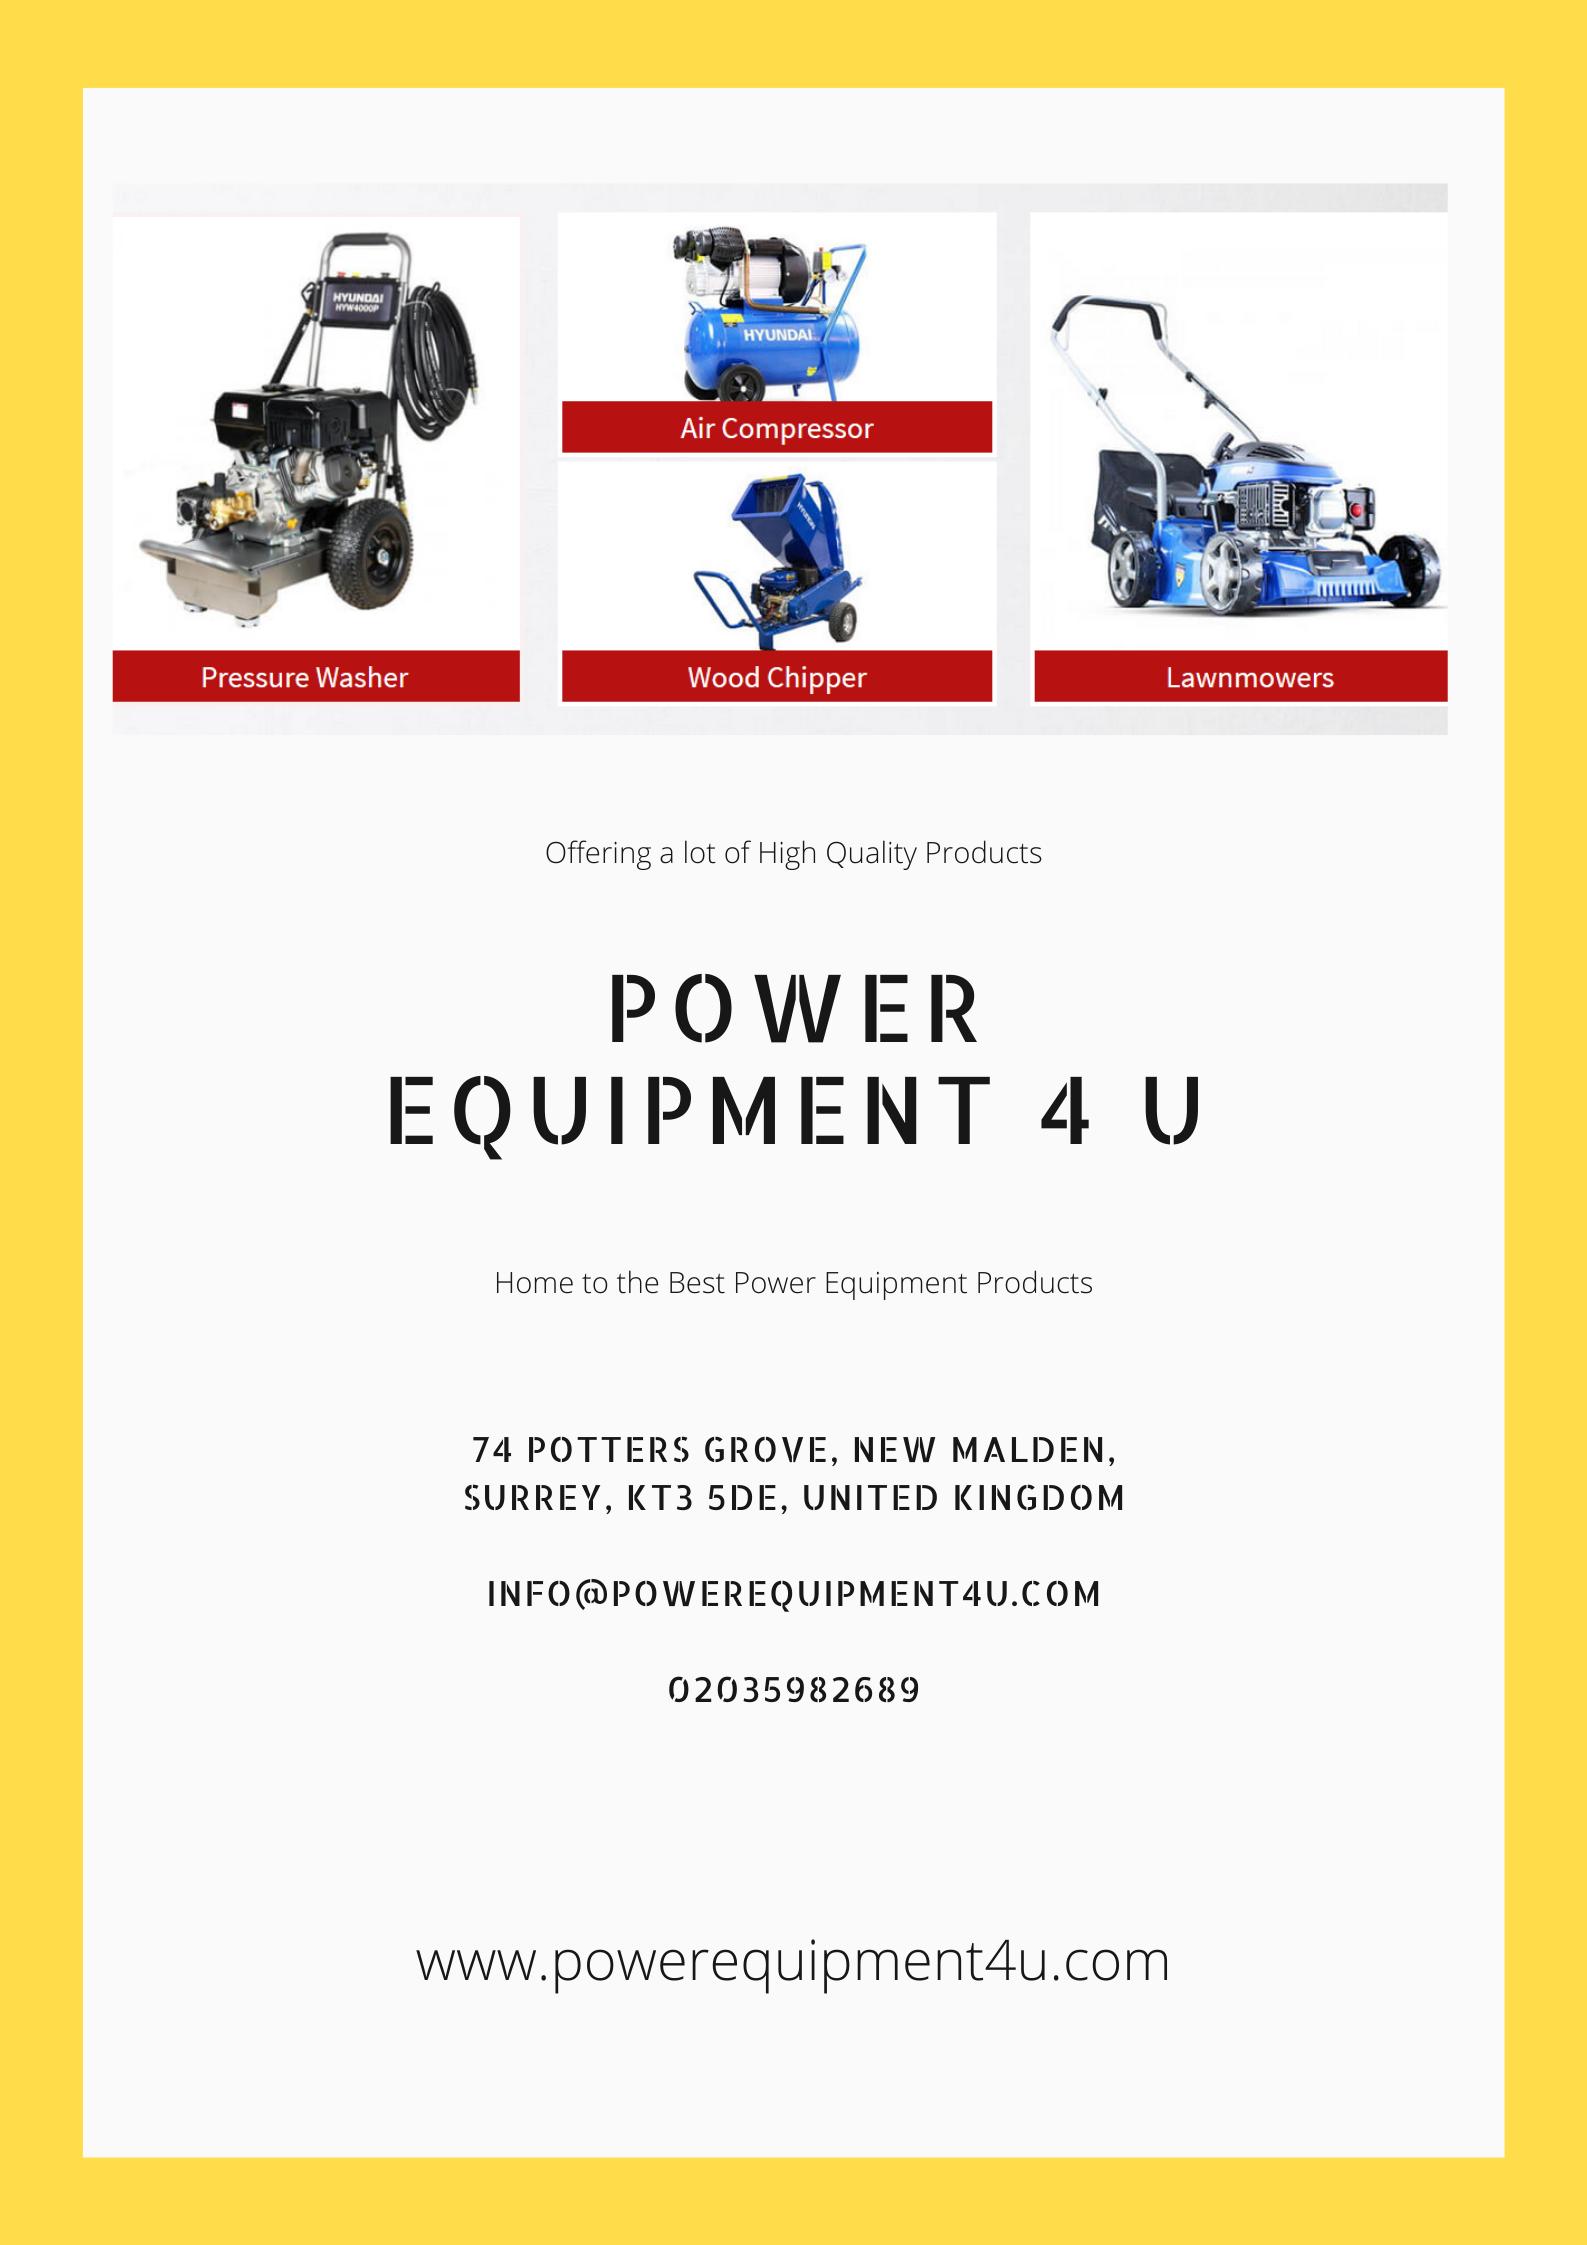 PowerEquipment4U is providing you the best garden